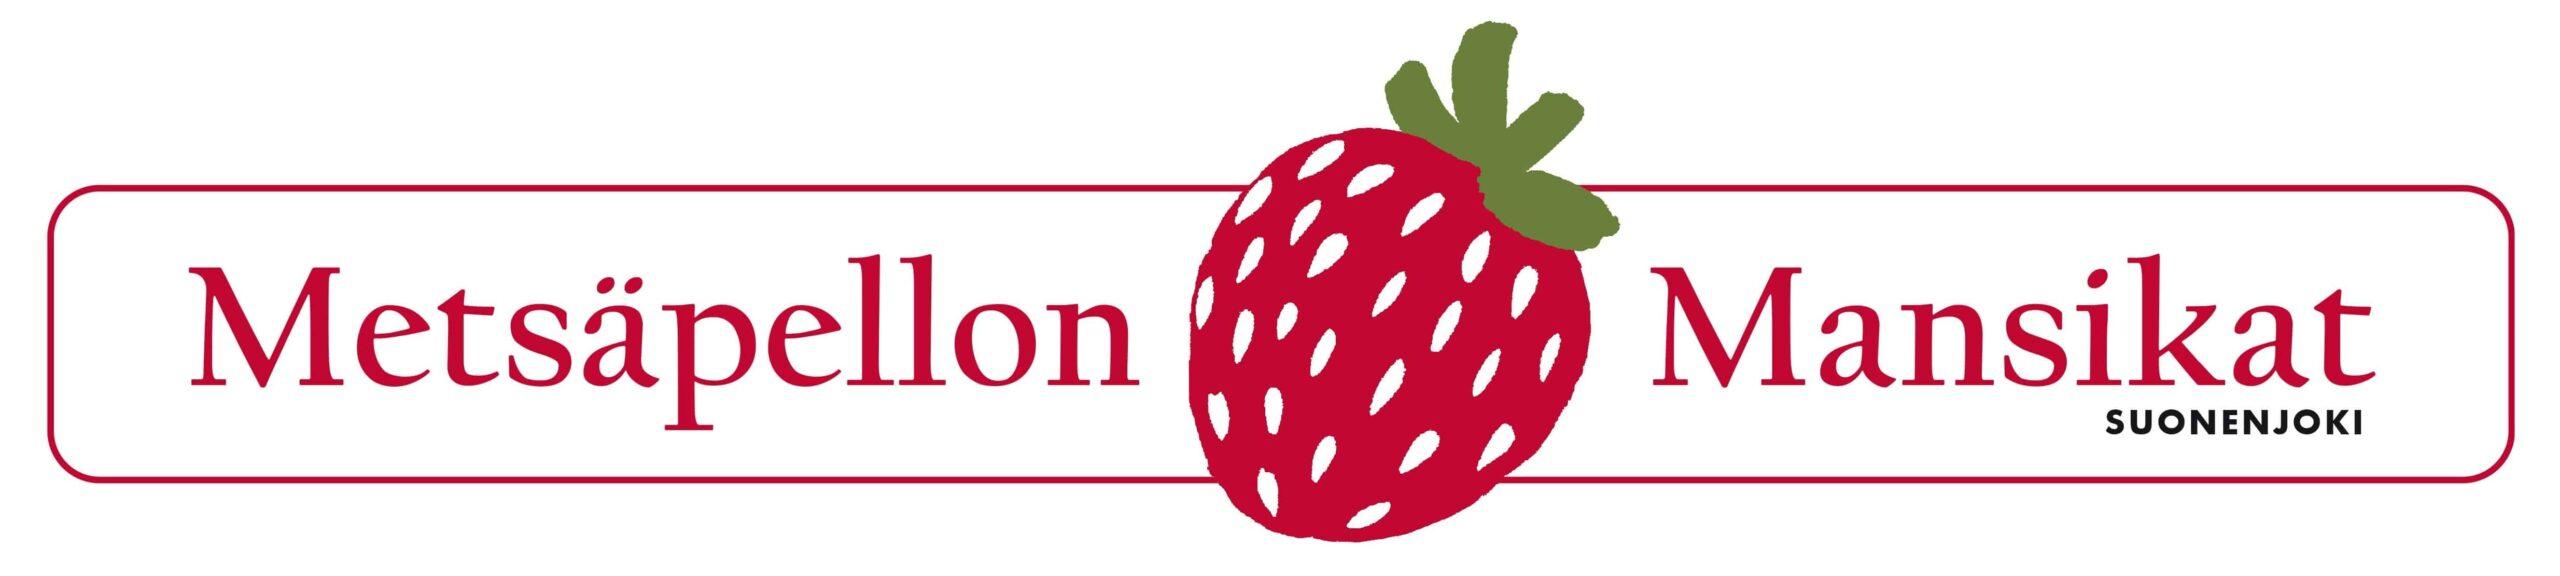 logo_metsäpellon mansikat